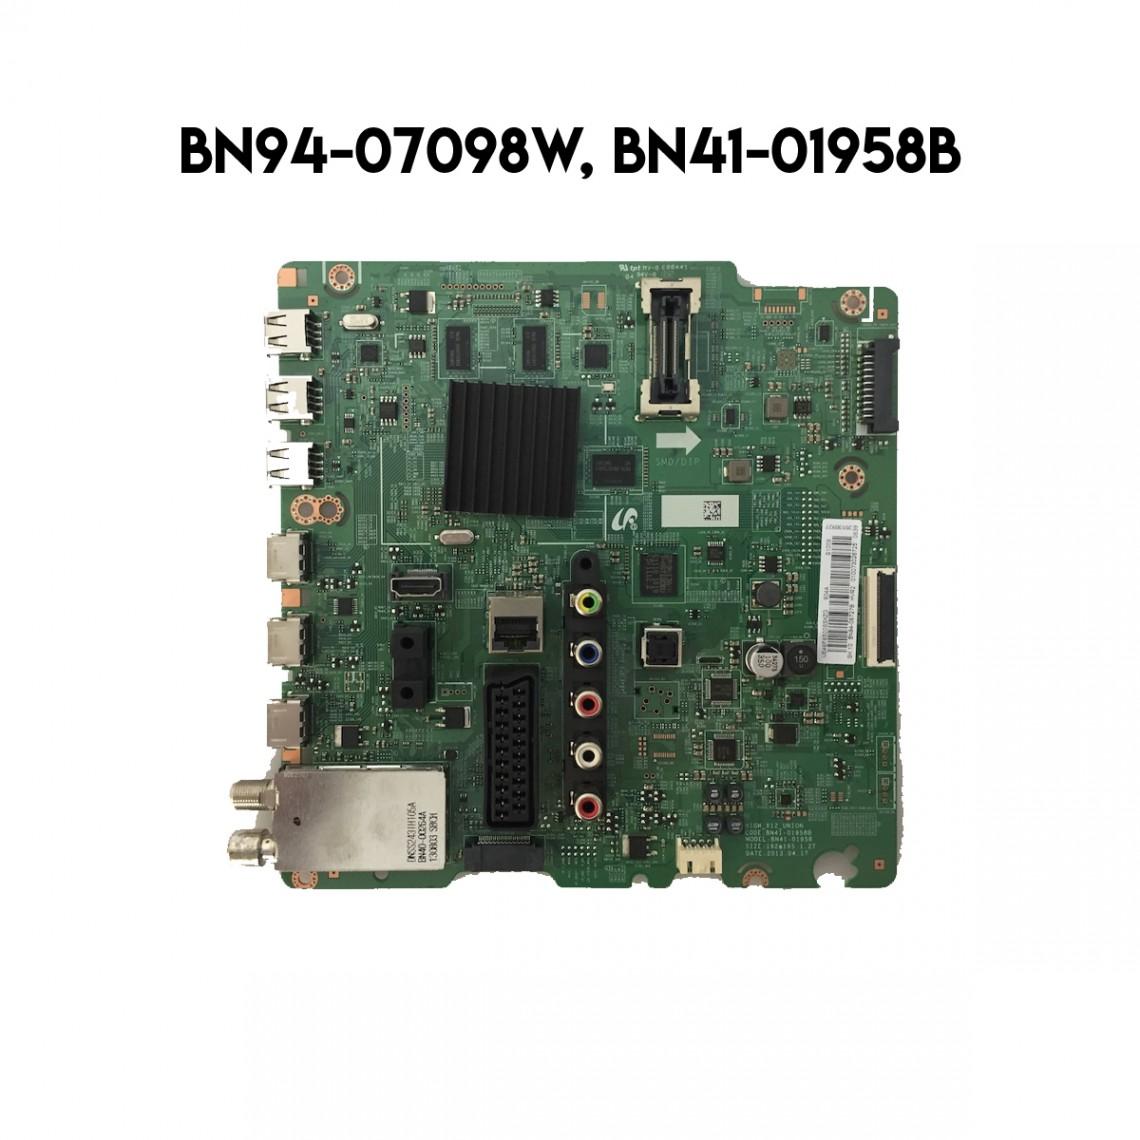 BN94-07098W, BN41-01958, BN41-01958B, UE46F6500, SAMSUNG MAİN BOARD